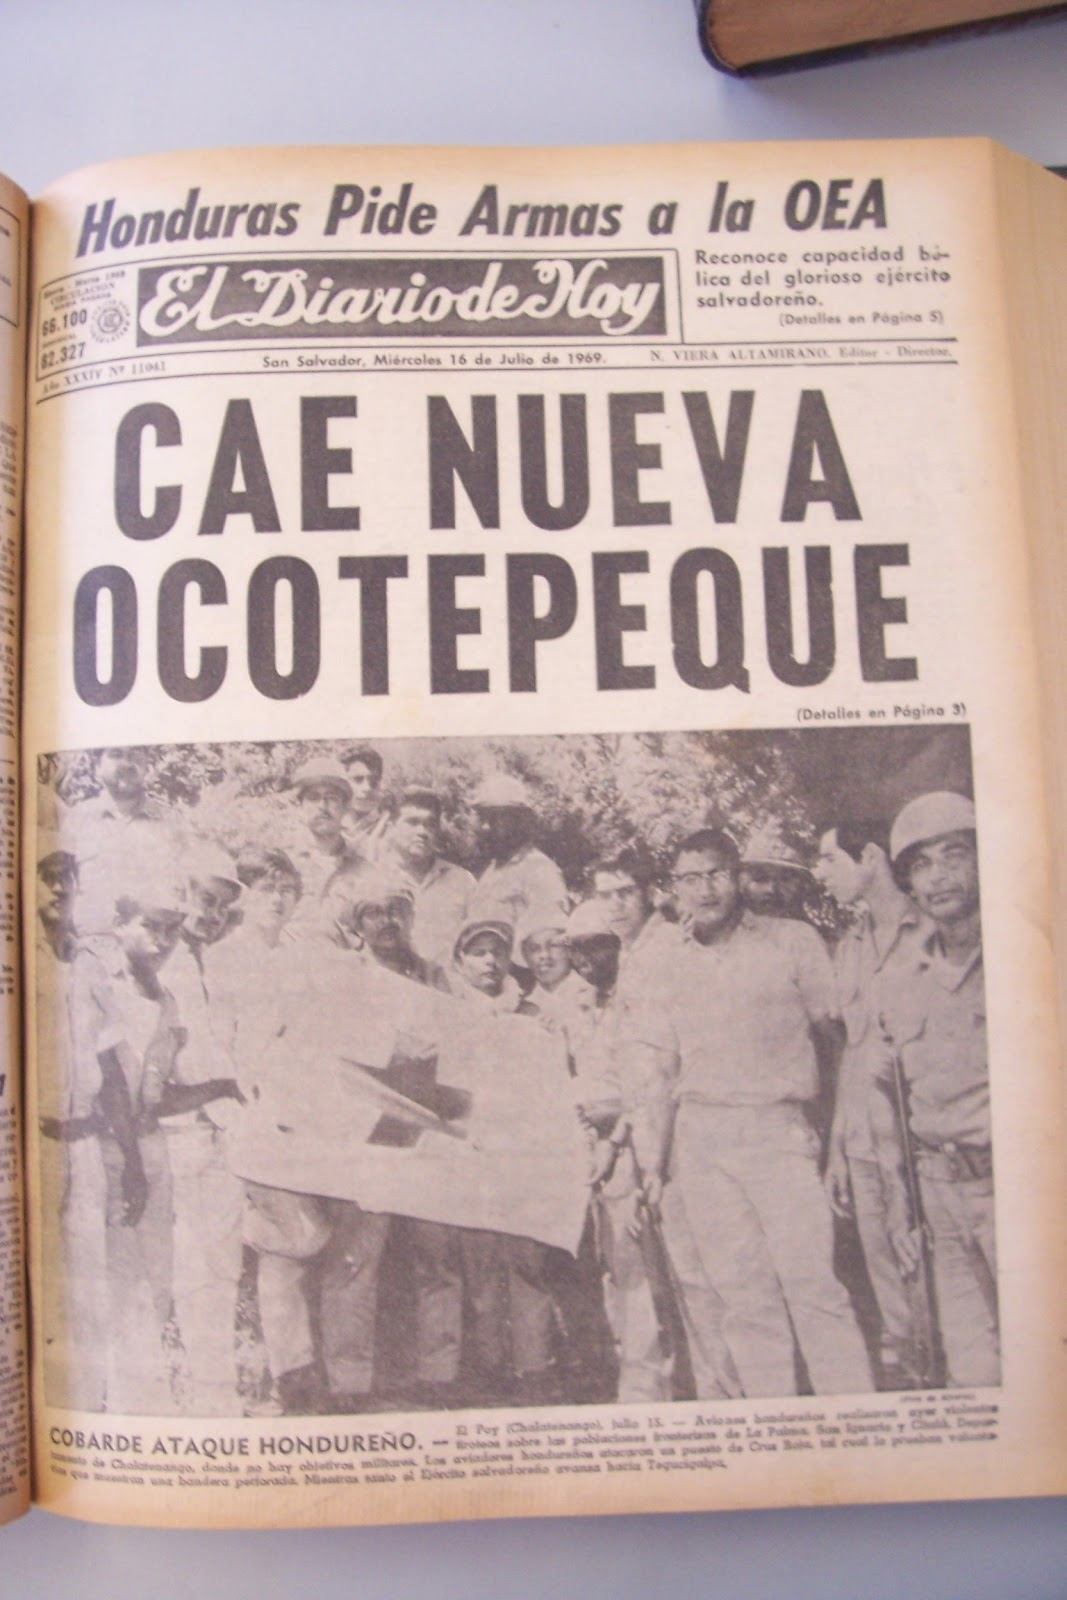 historia periodico salvador: